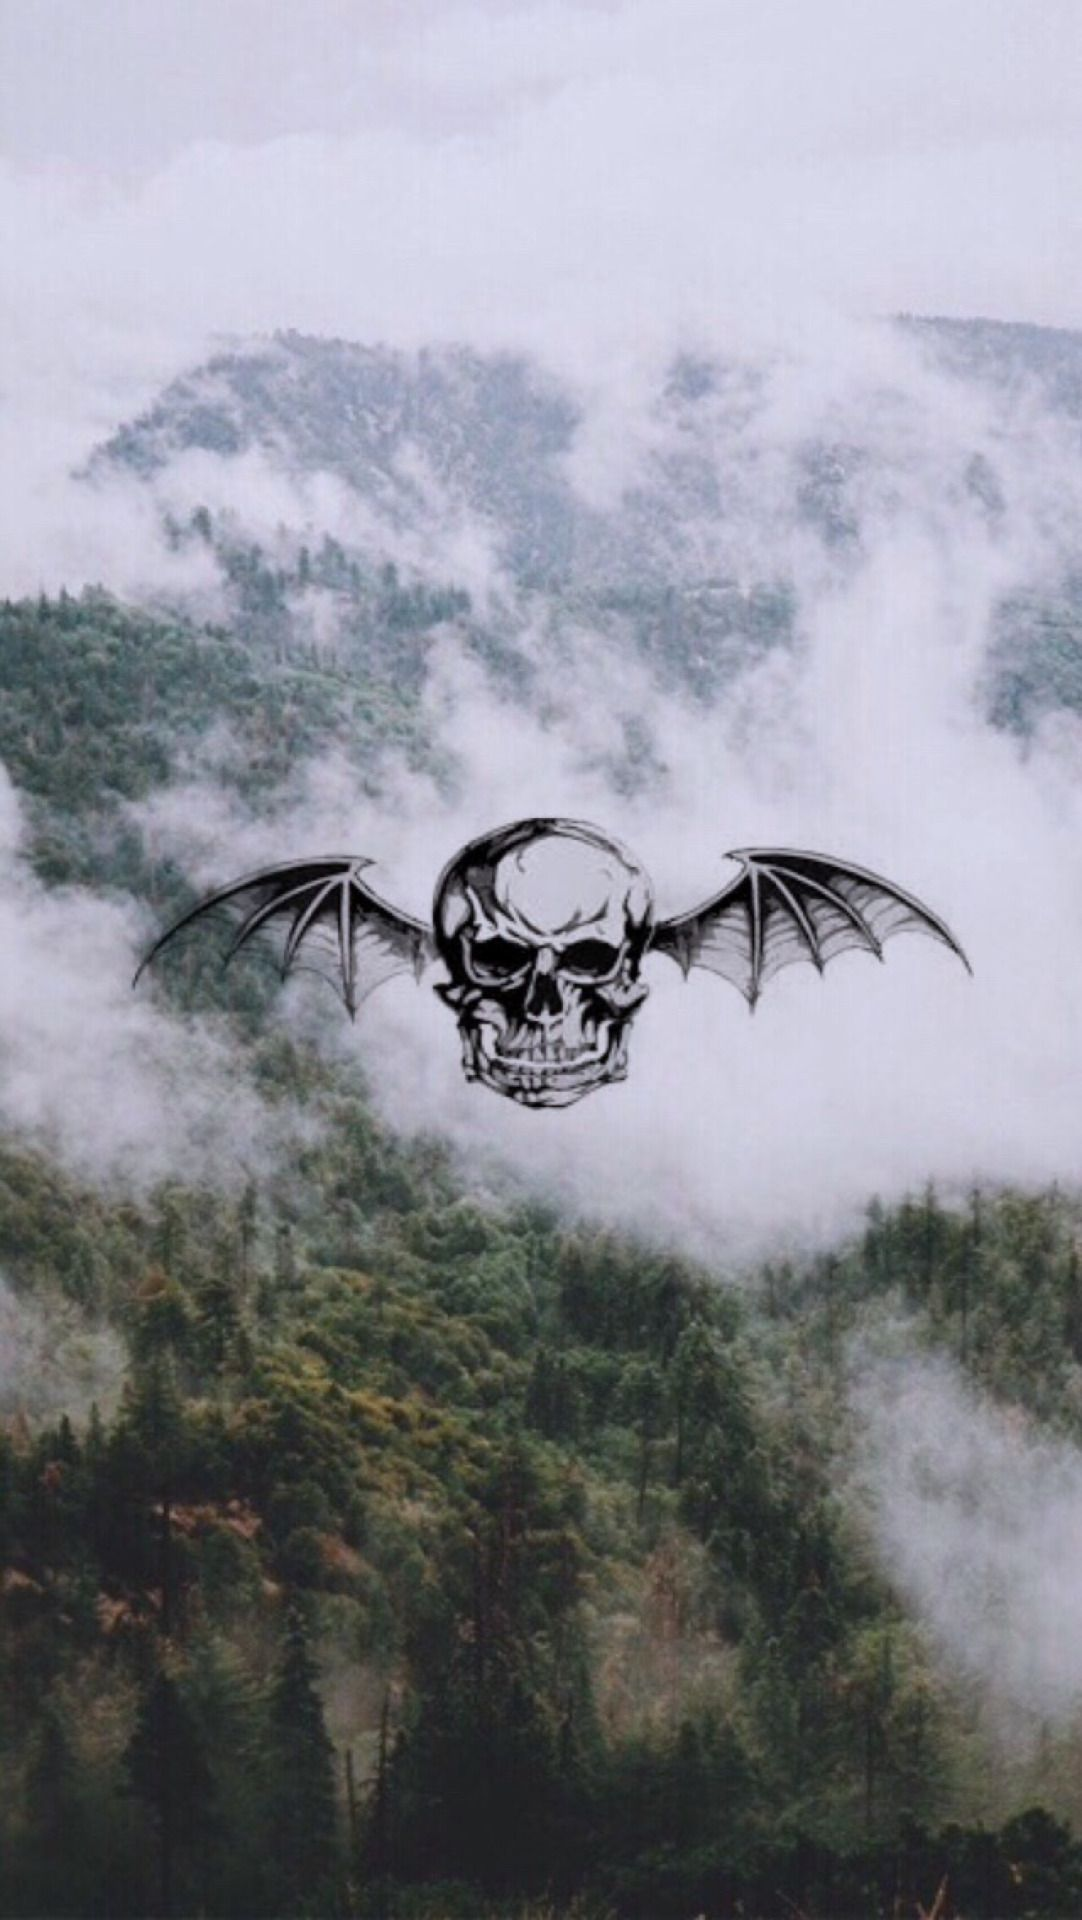 Pretty Epic Deathbat Wallpaper Picture Found On Tumblr Hqlockscreens Avenged Sevenfold Wallpapers Avenged Sevenfold Art Avenged Sevenfold